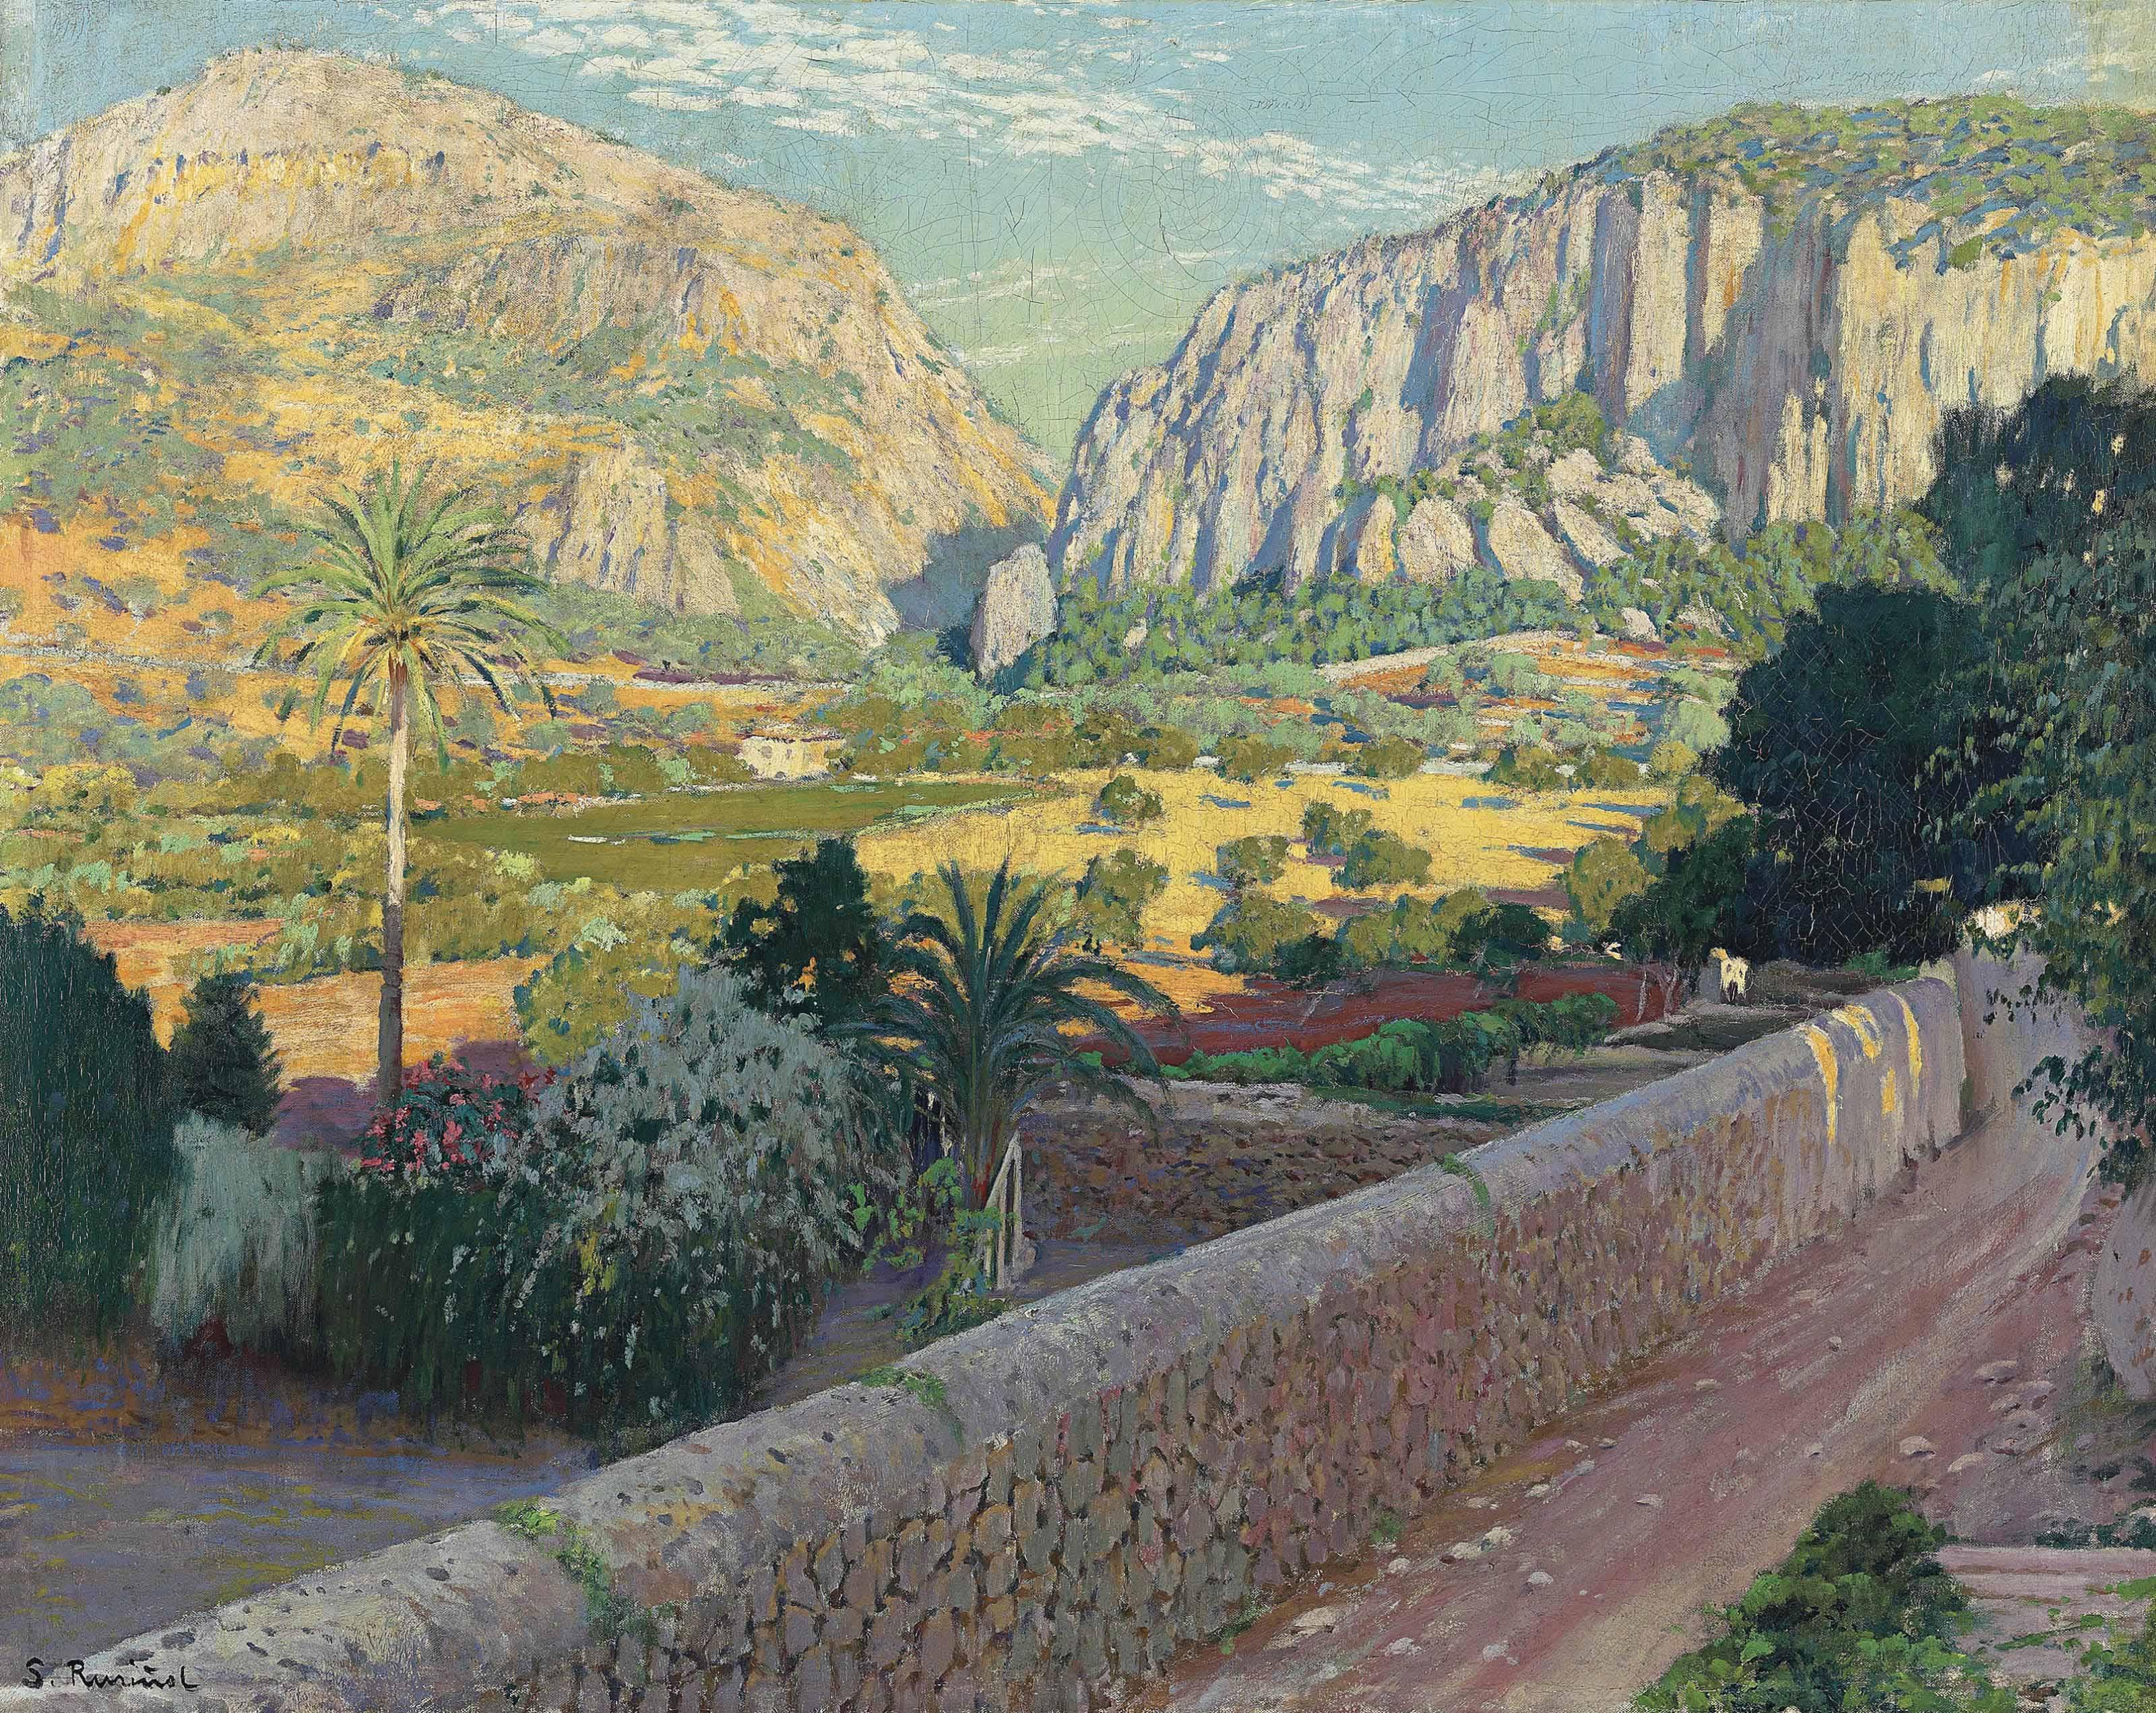 L'estret de Valldemossa, Mallorca